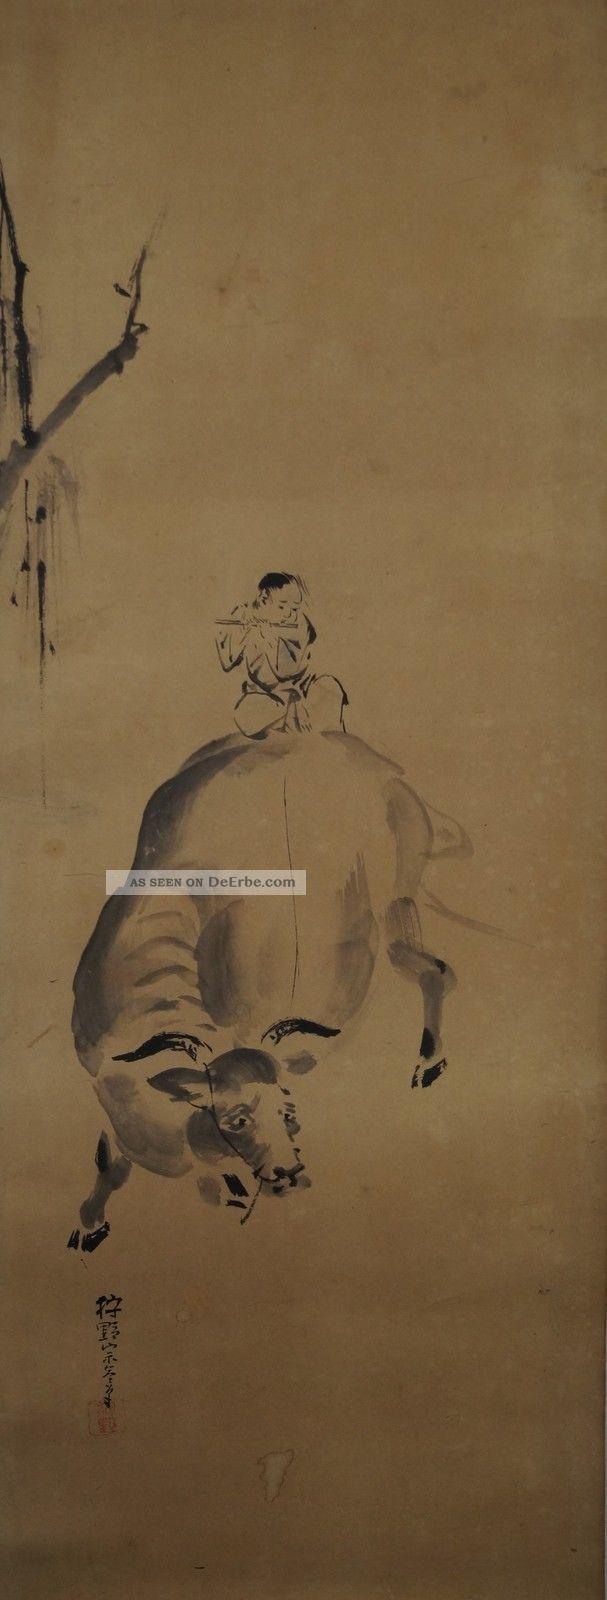 Japanisches Rollbild Makuri Honshi Flötenspieler & Kuh Japan Scroll Cow 3340 Asiatika: Japan Bild